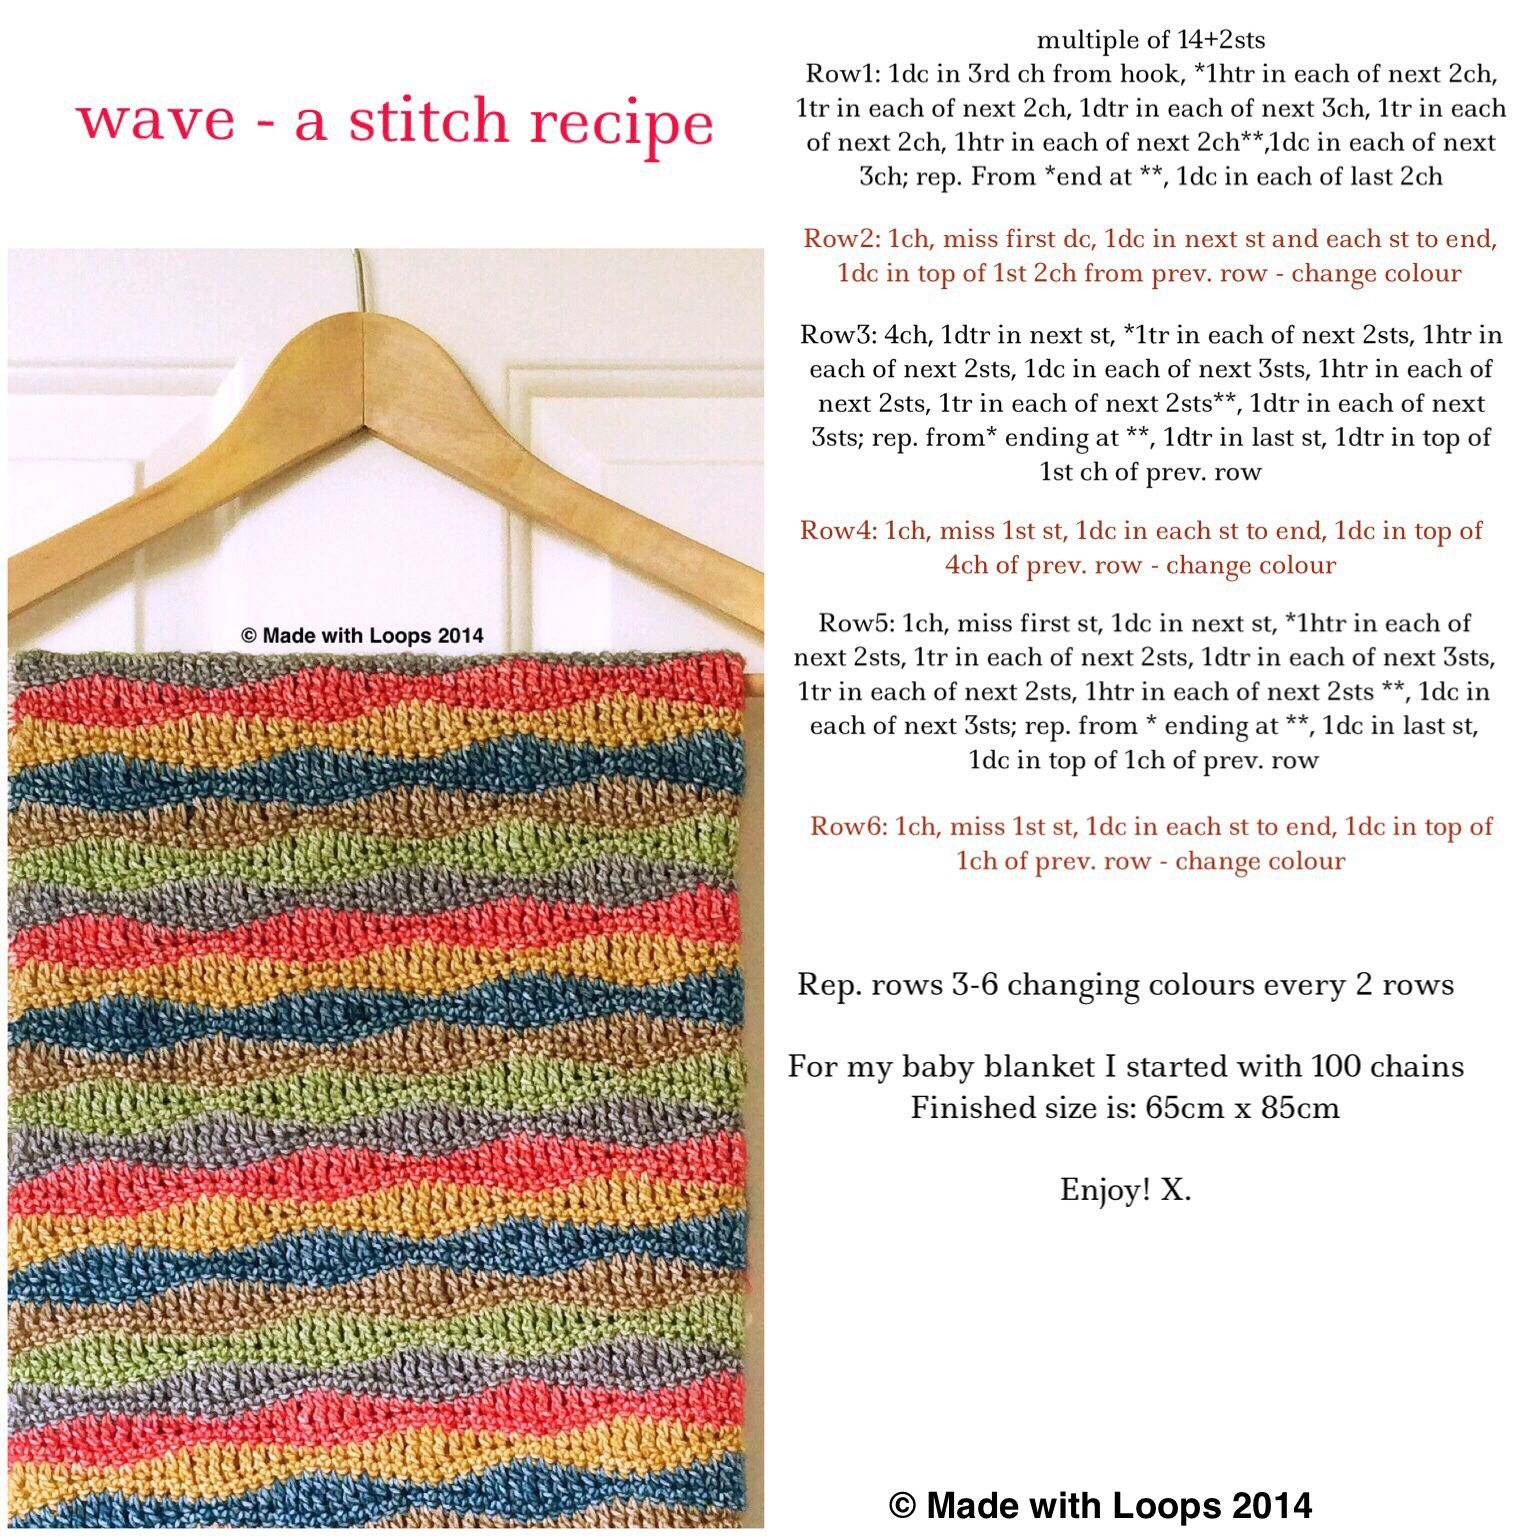 Baby Blanket - Free Pattern at www.madewithloops.co.uk   Crochet ...